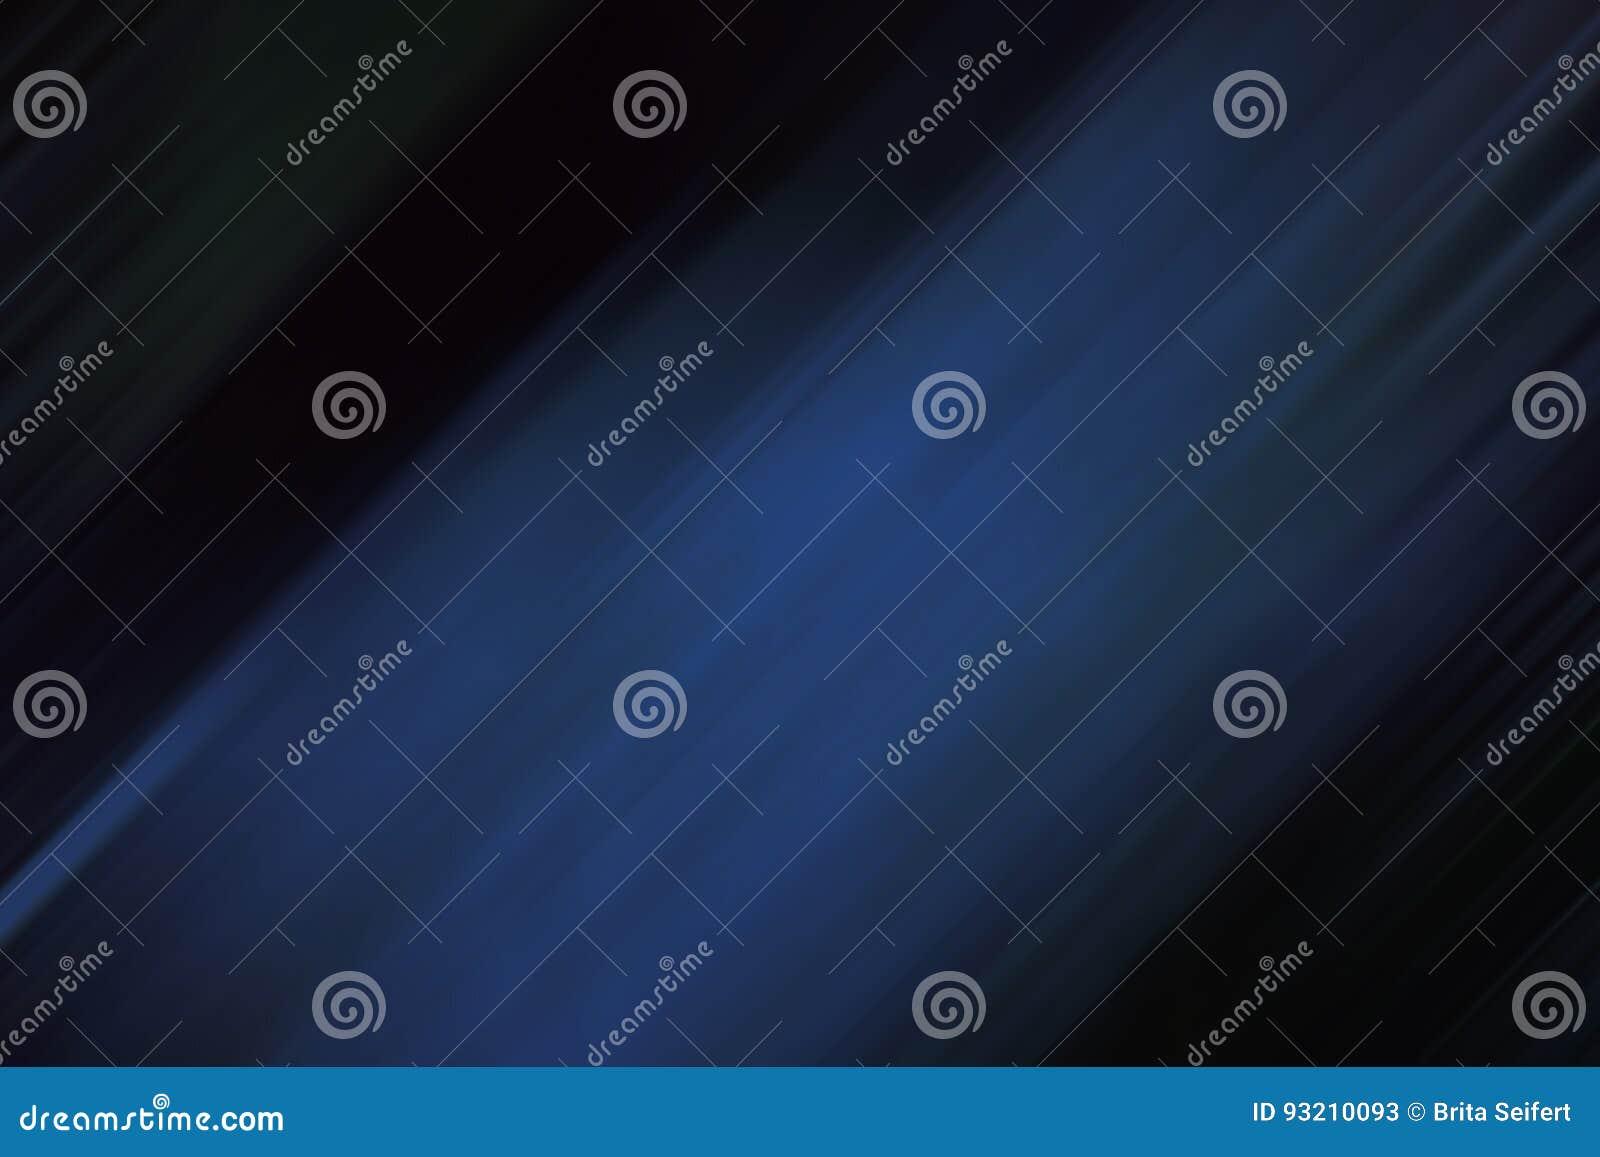 Obscuridade abstrata - fundo azul com listras